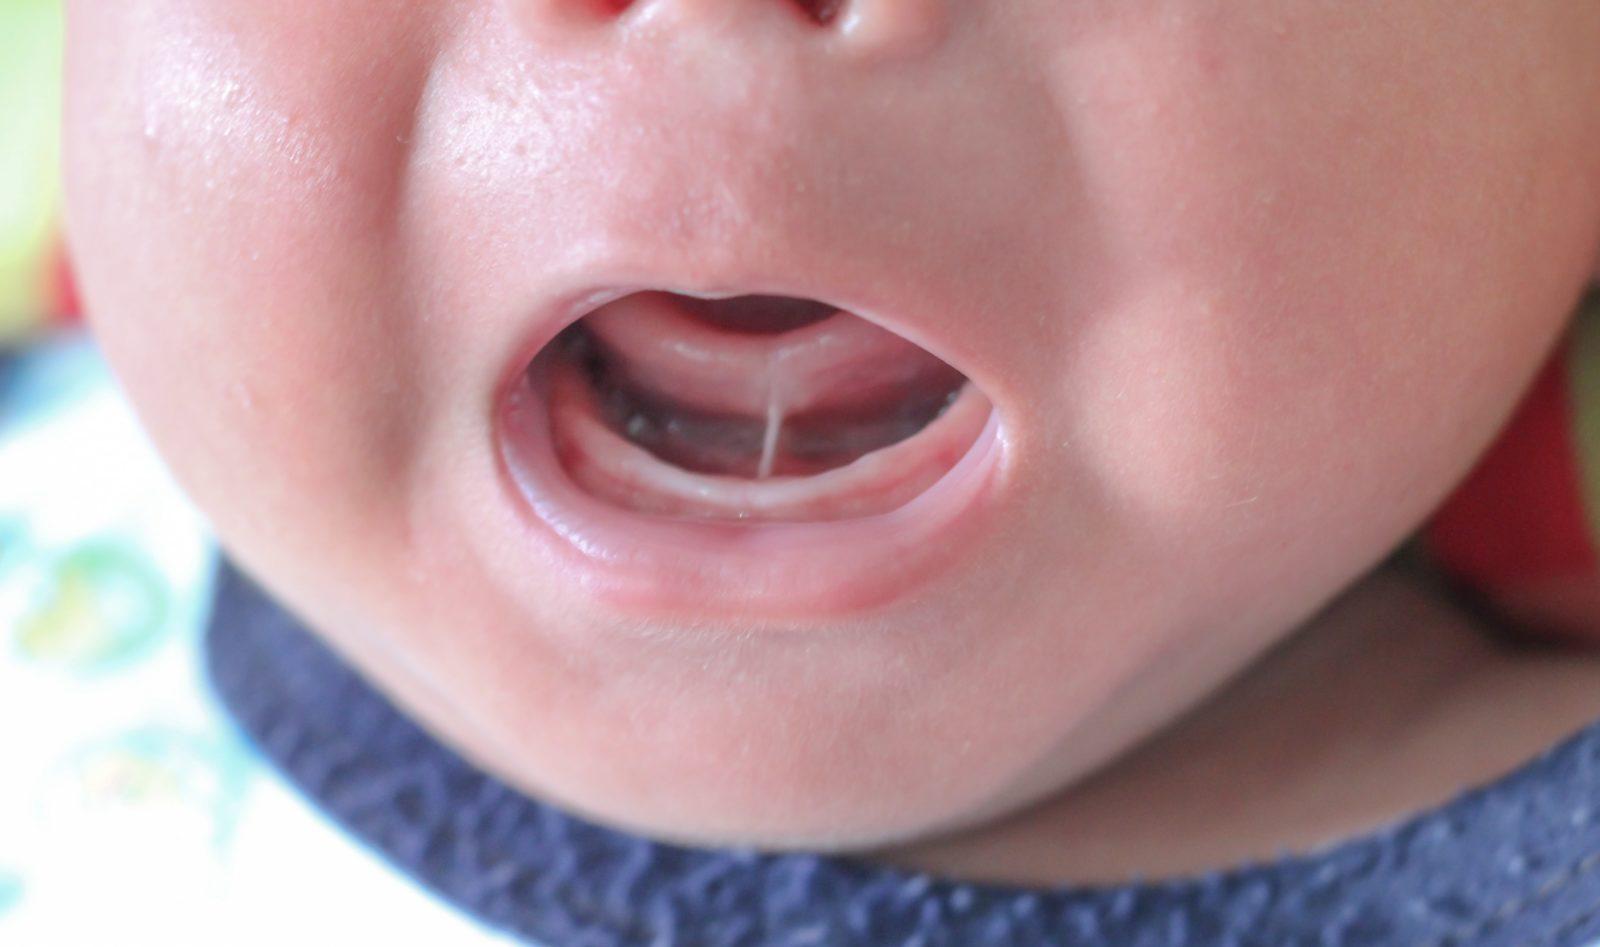 newborn with tongue tie